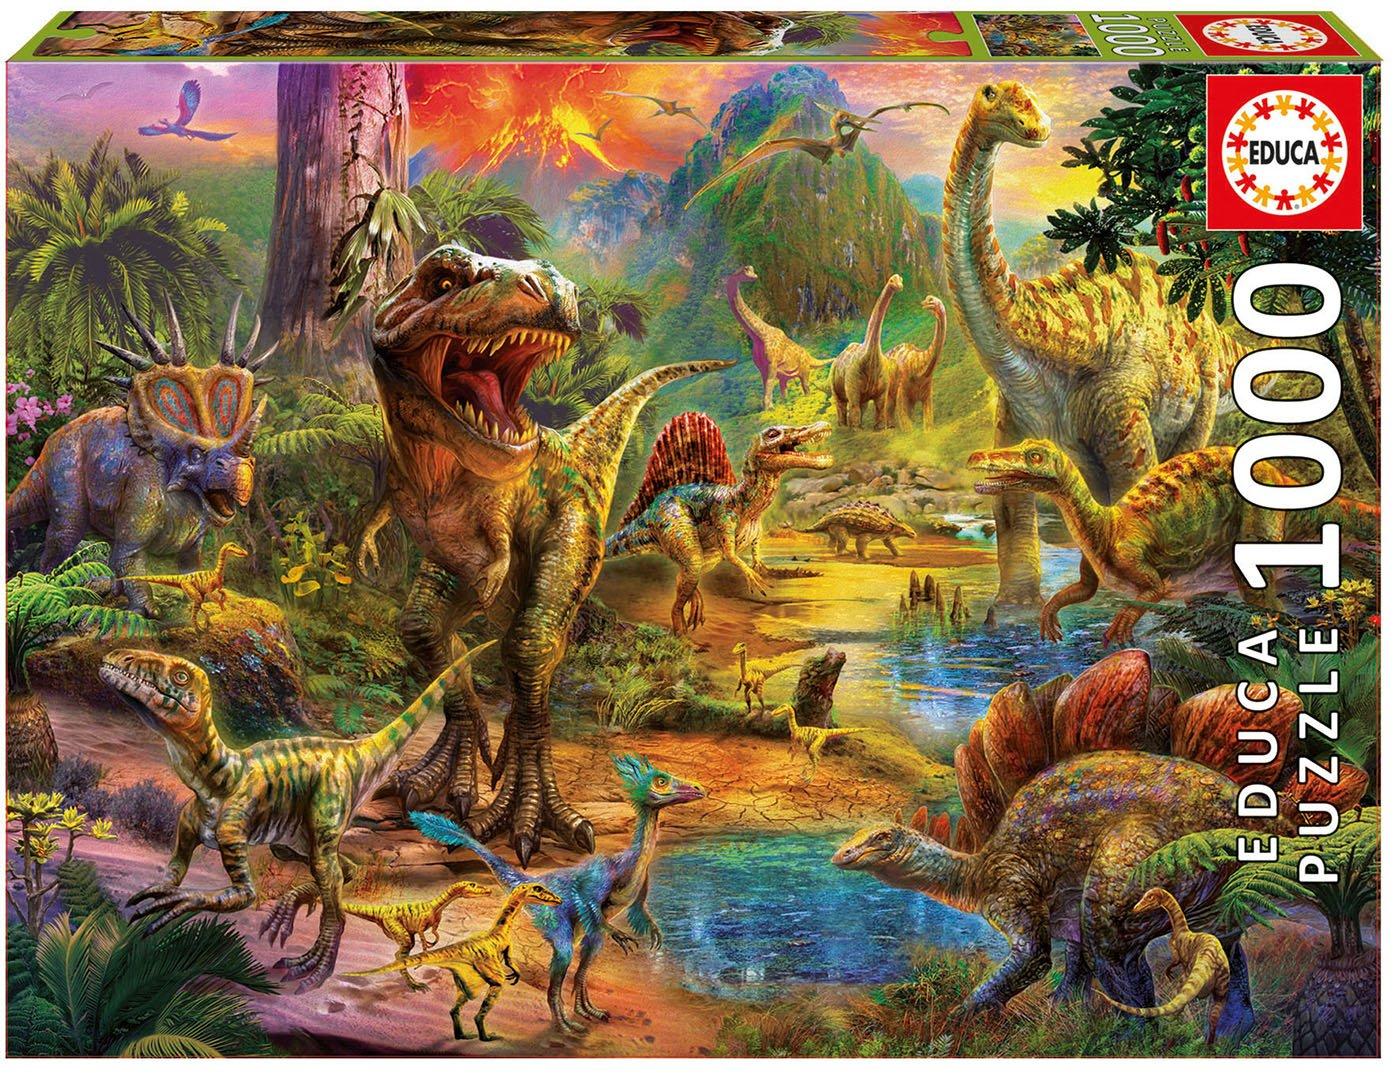 Educa 1000 Pc Land Land of Educa B0793LNB46 Dinosaurs Puzzle B0793LNB46, イケベ楽器楽天ショップ:d7802afc --- ero-shop-kupidon.ru